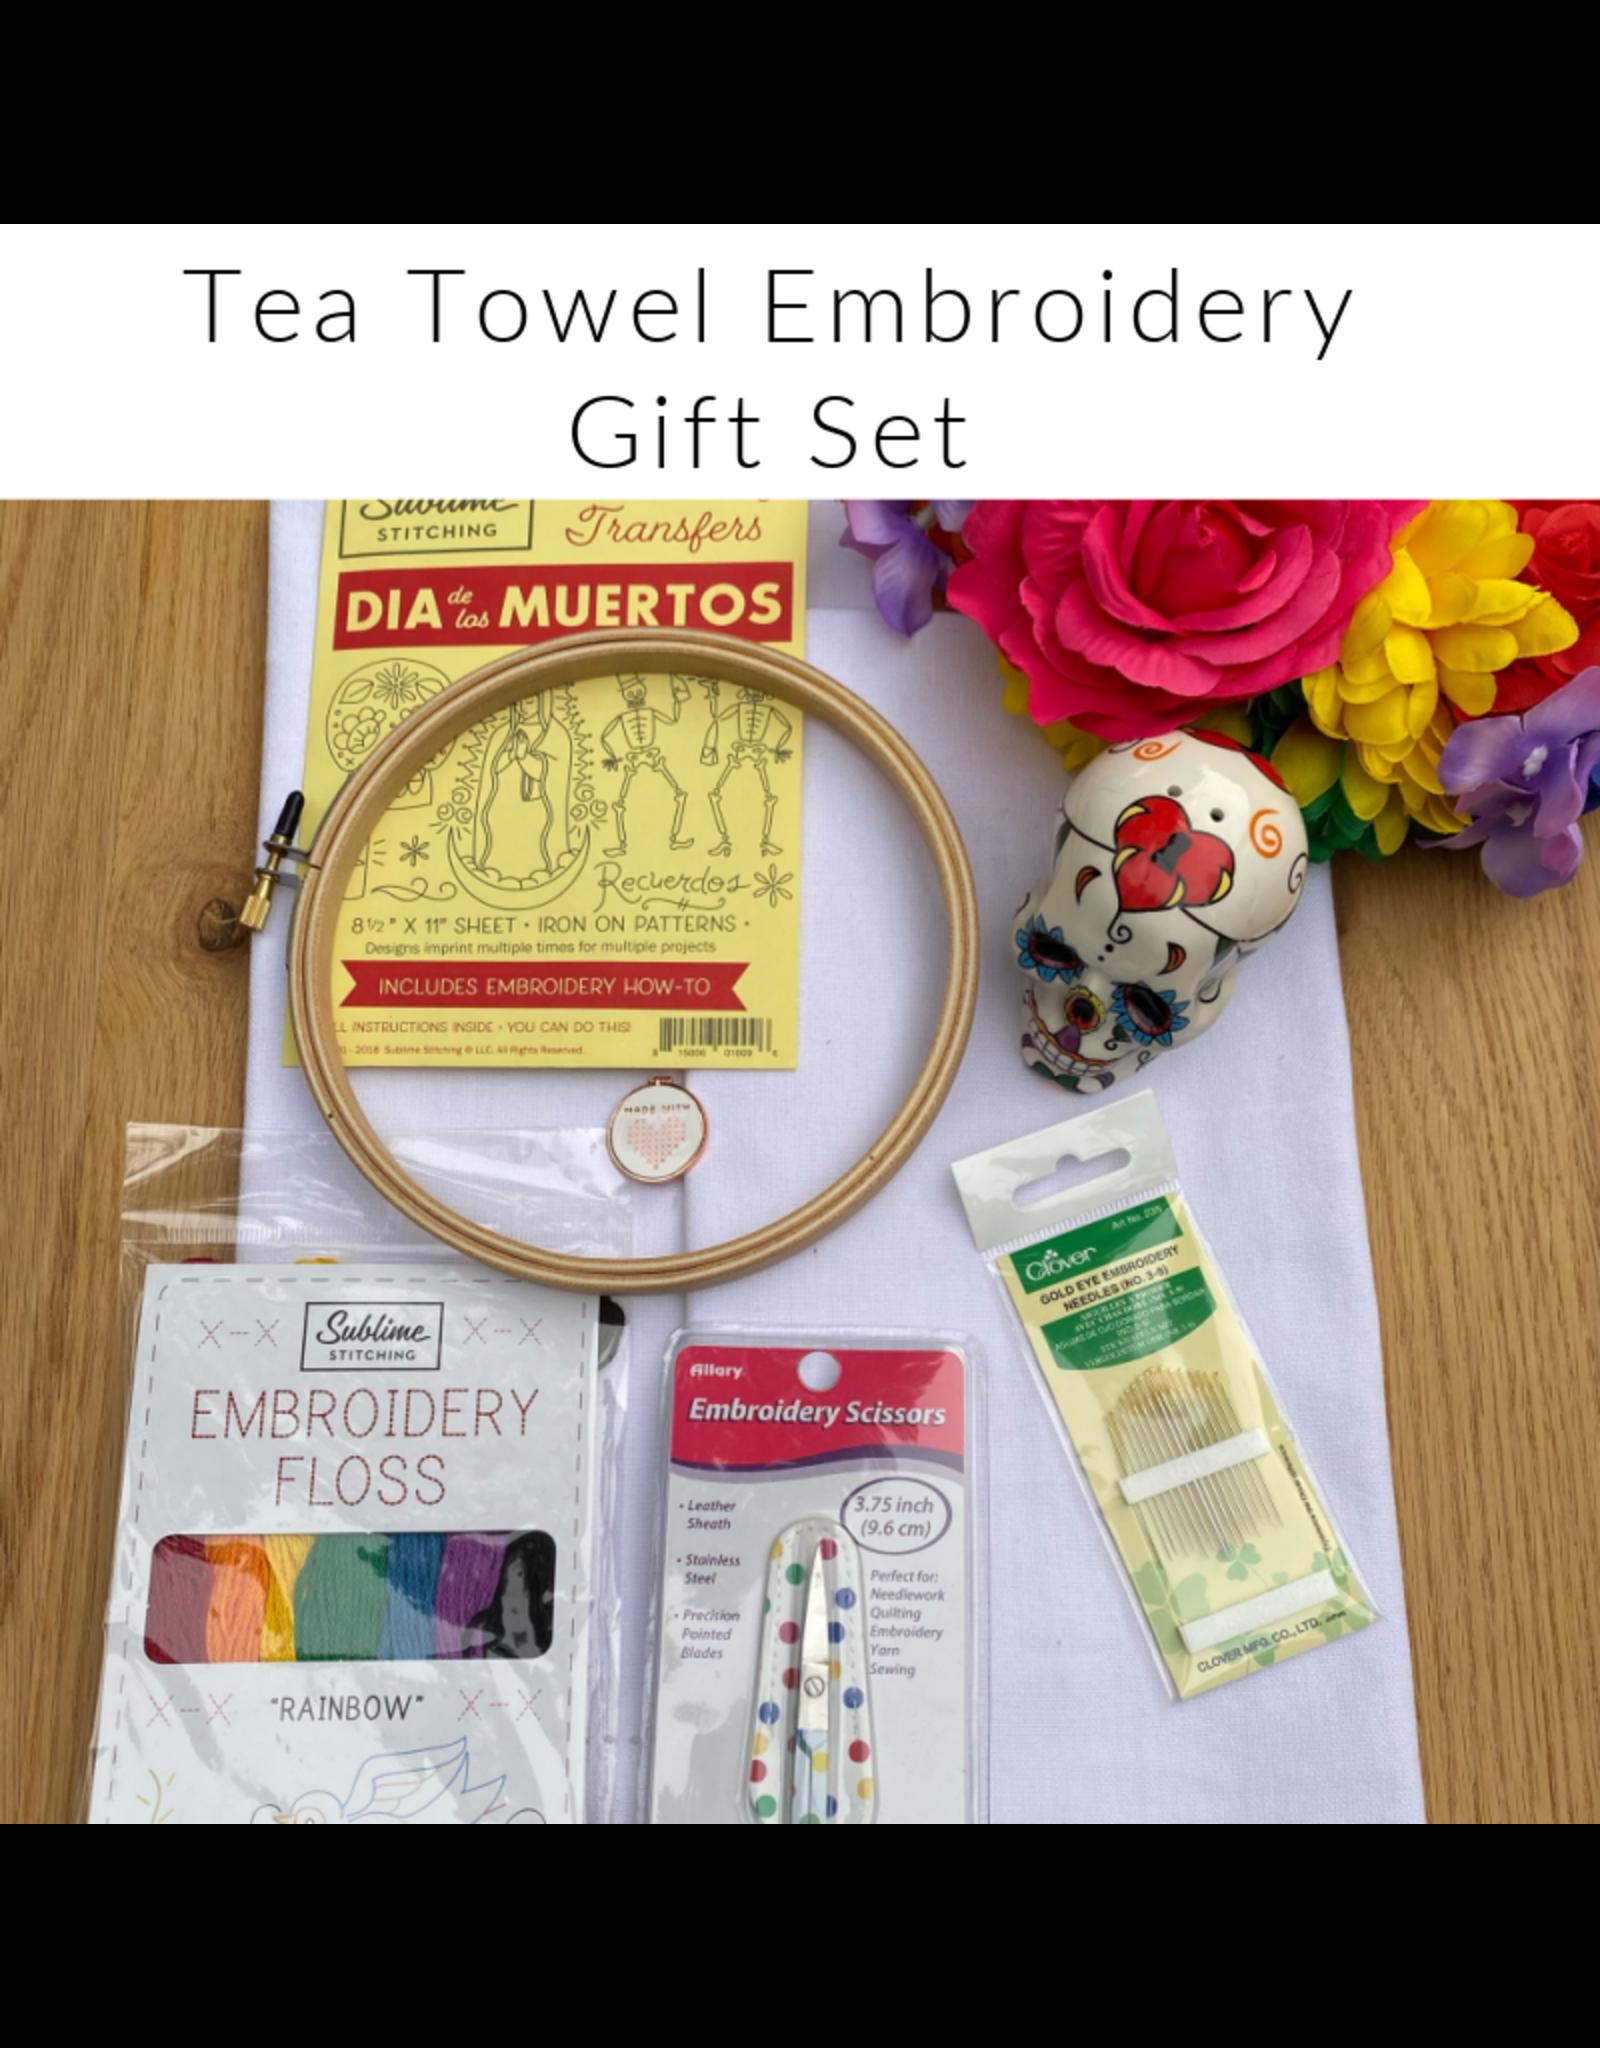 Picking Daisies Embroidery Kit, Tea Towel Gift Set, Dia de los Muertos with Rainbow Floss